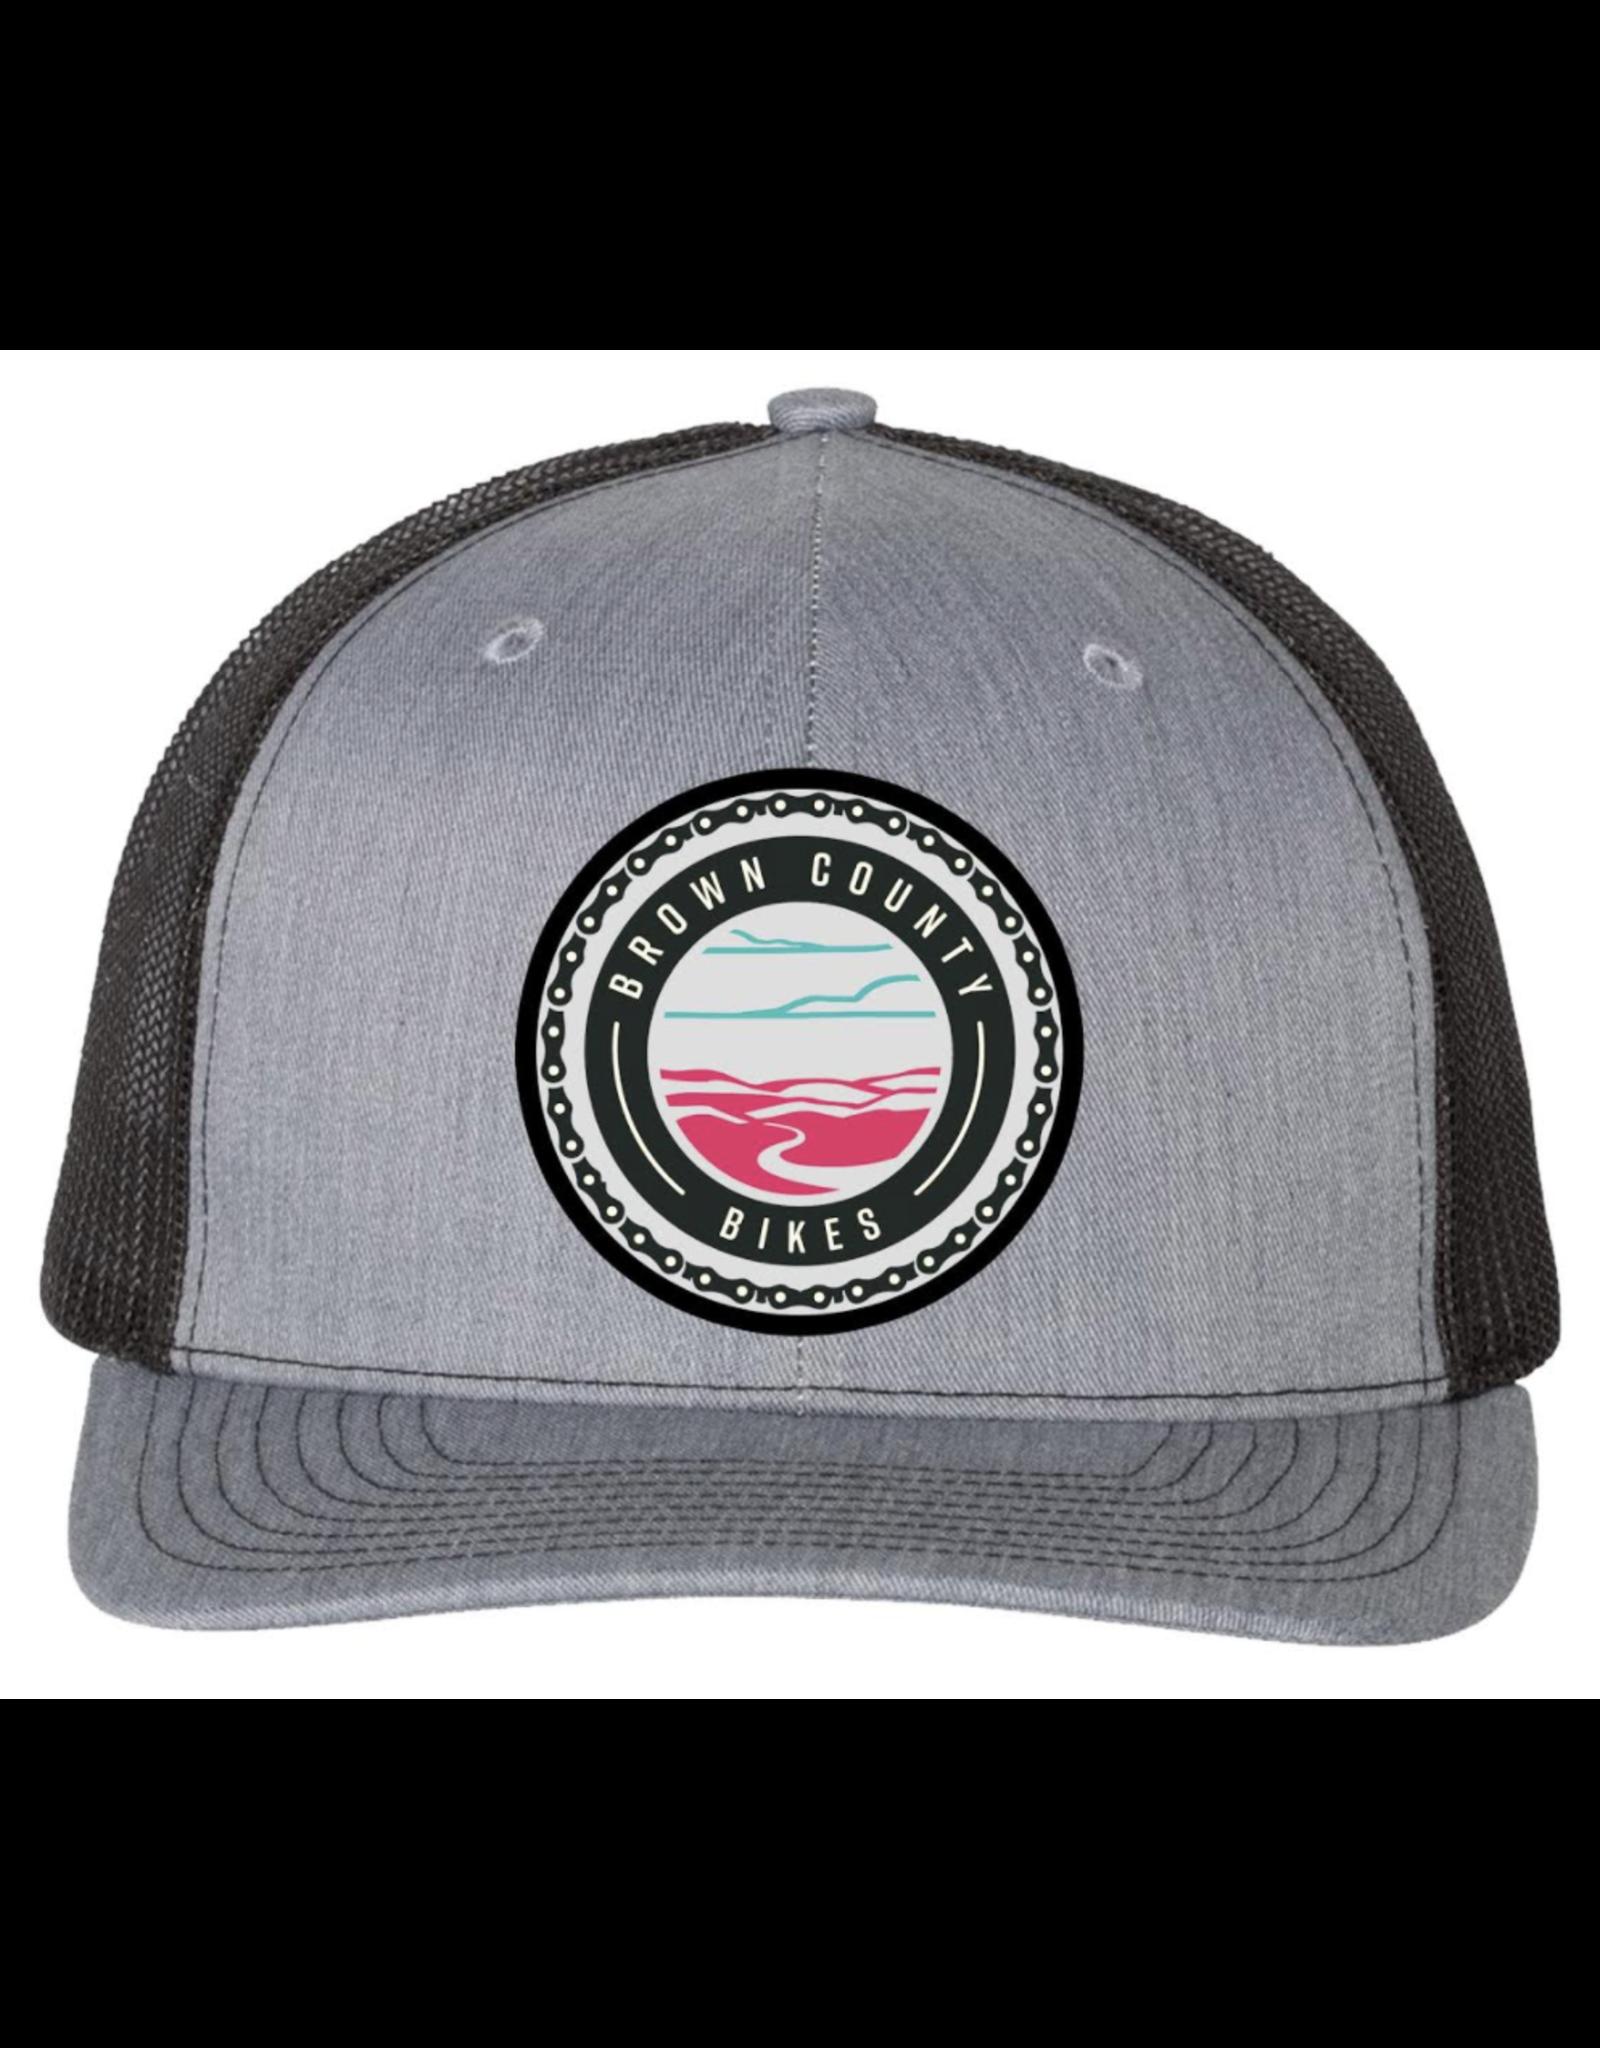 Brown County Bikes Trucker Hat Grey/Black